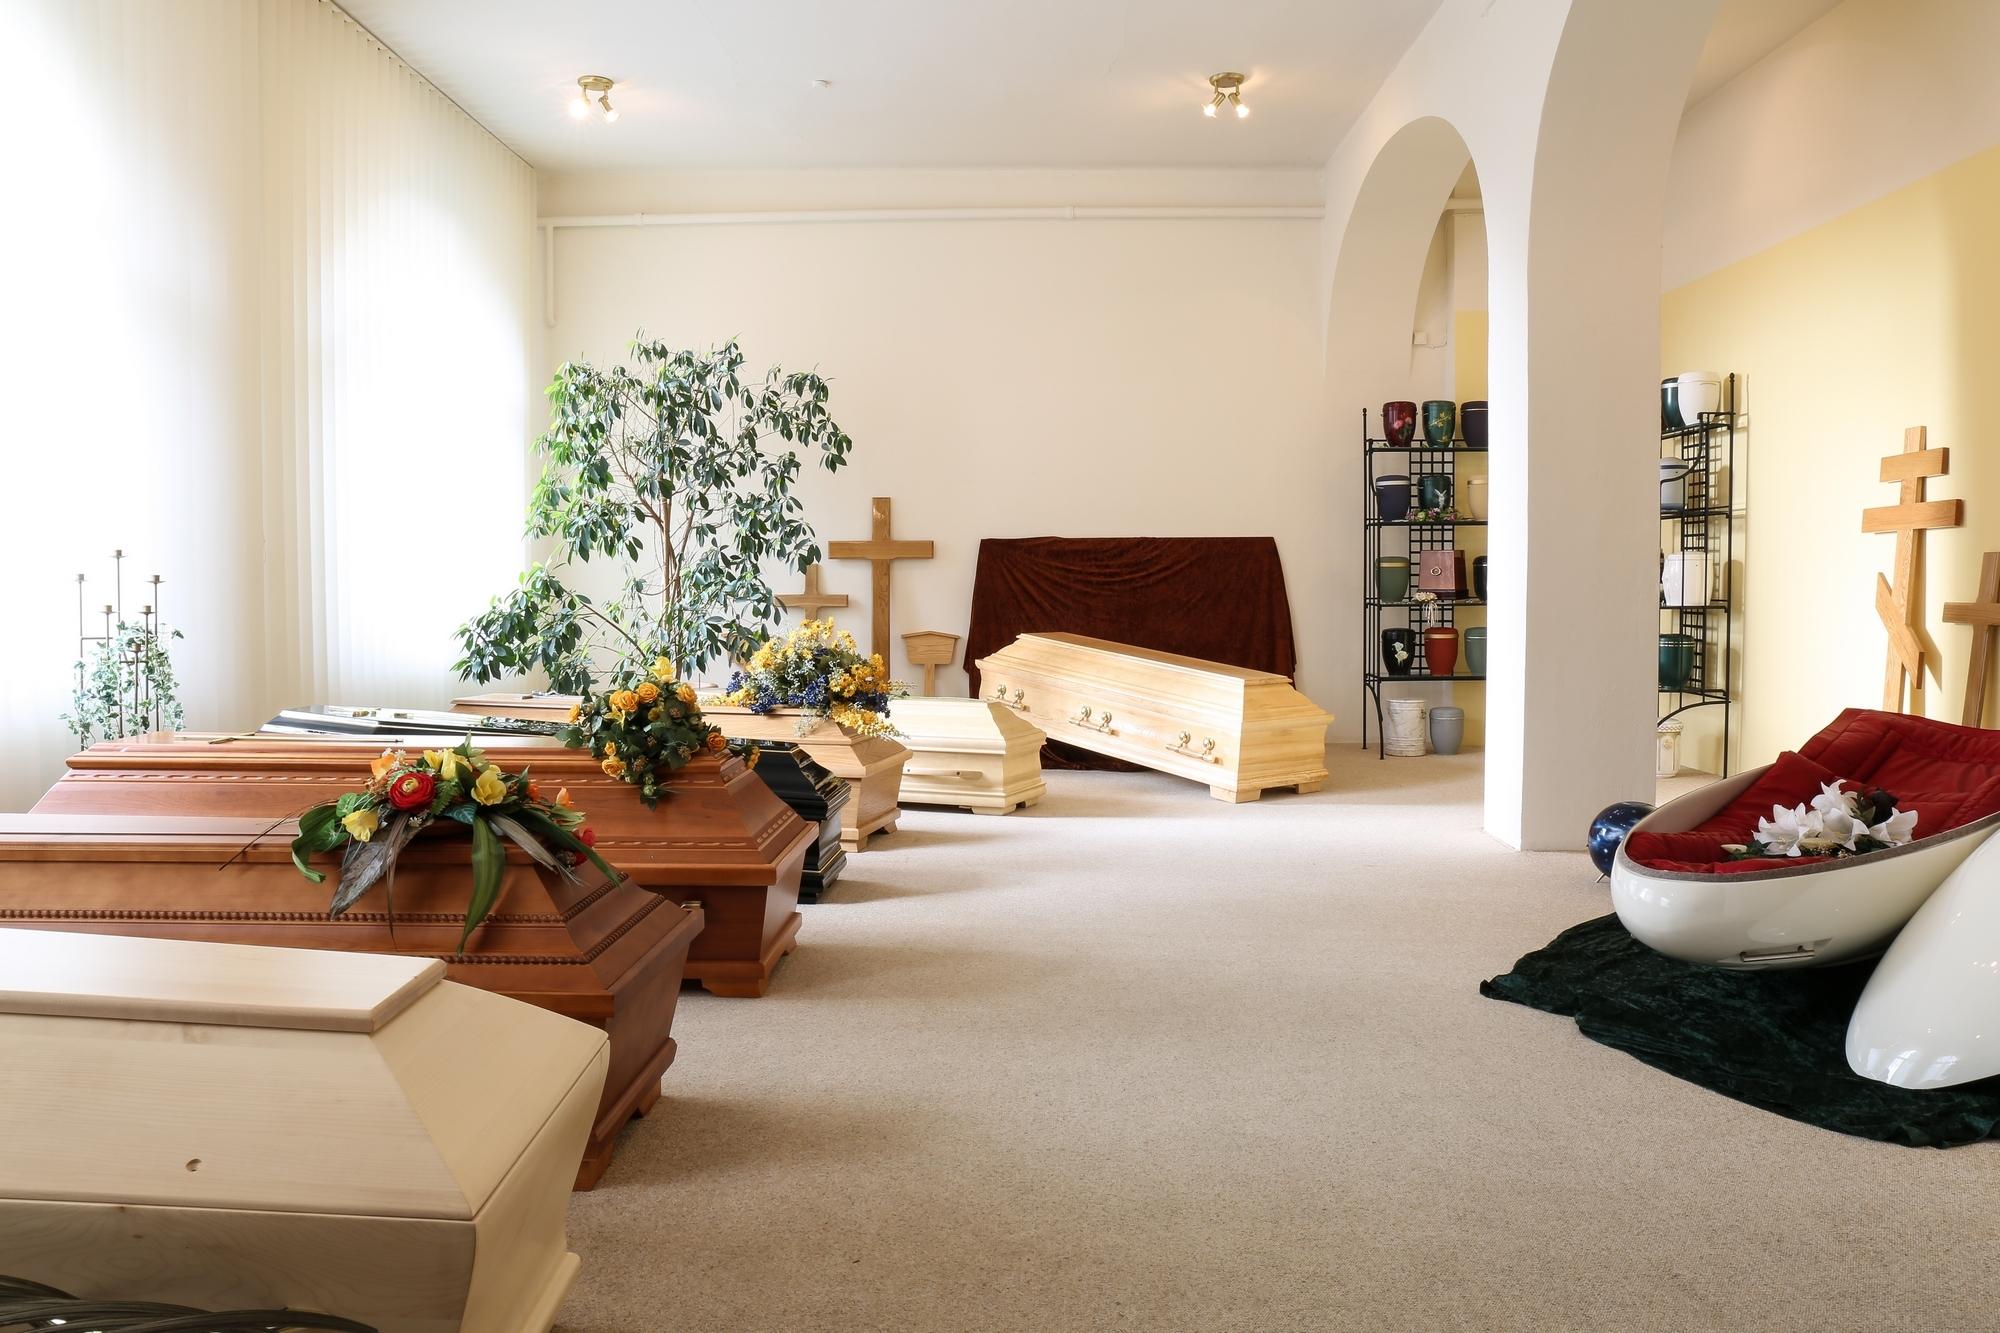 andere gewerbe dienstleistungen beerdigungen in. Black Bedroom Furniture Sets. Home Design Ideas